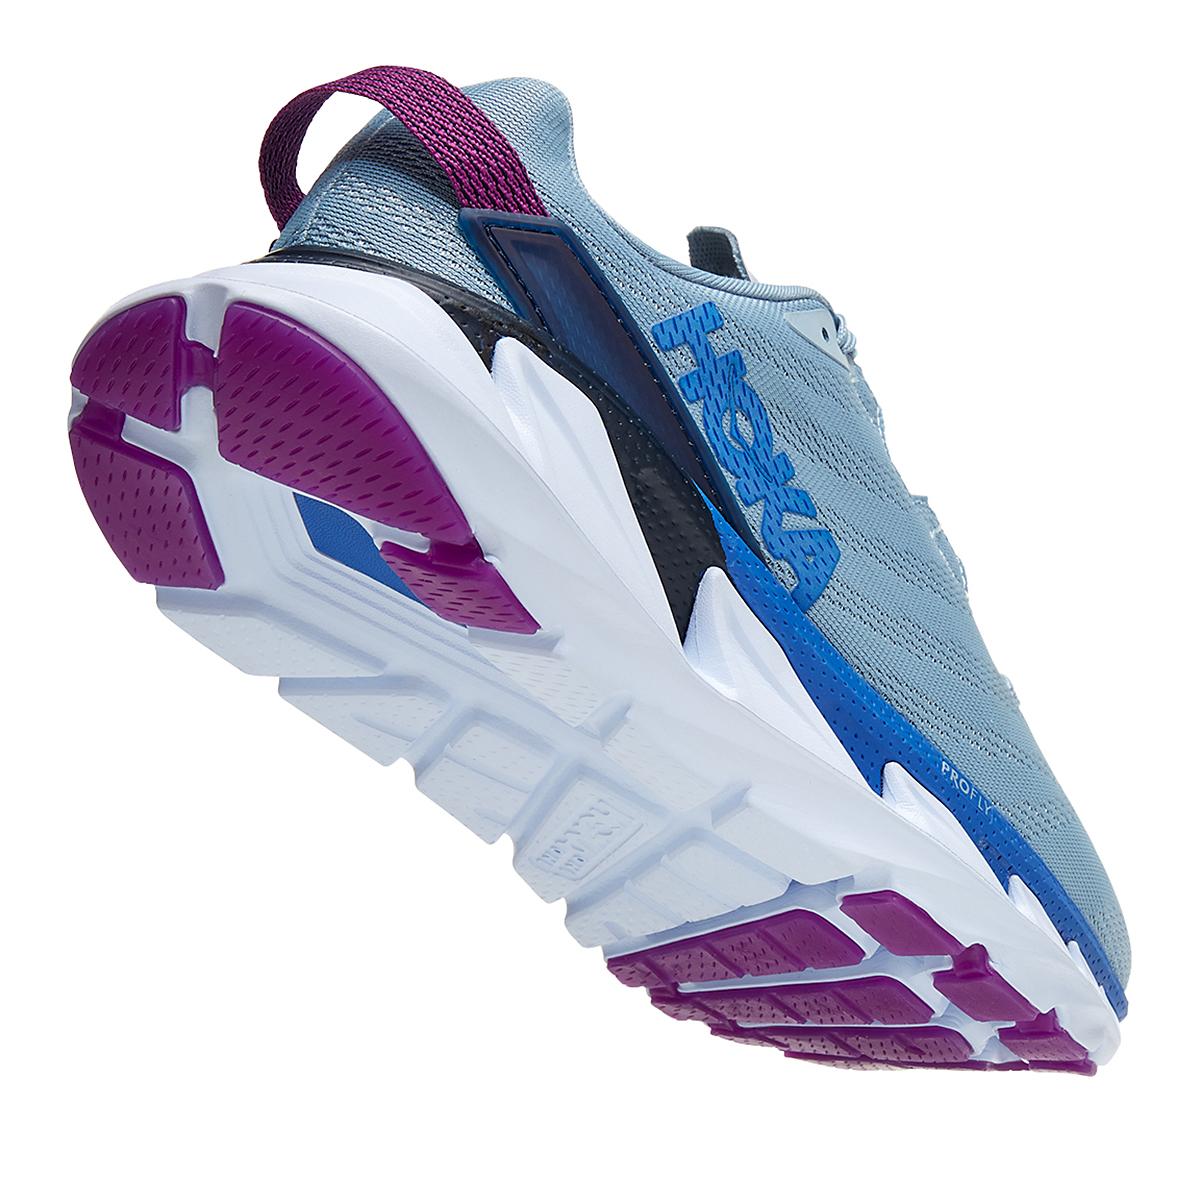 Women's Hoka One One Elevon 2 Running Shoe - Color: Ballad Blue - Size: 5 - Width: Regular, Ballad Blue, large, image 4